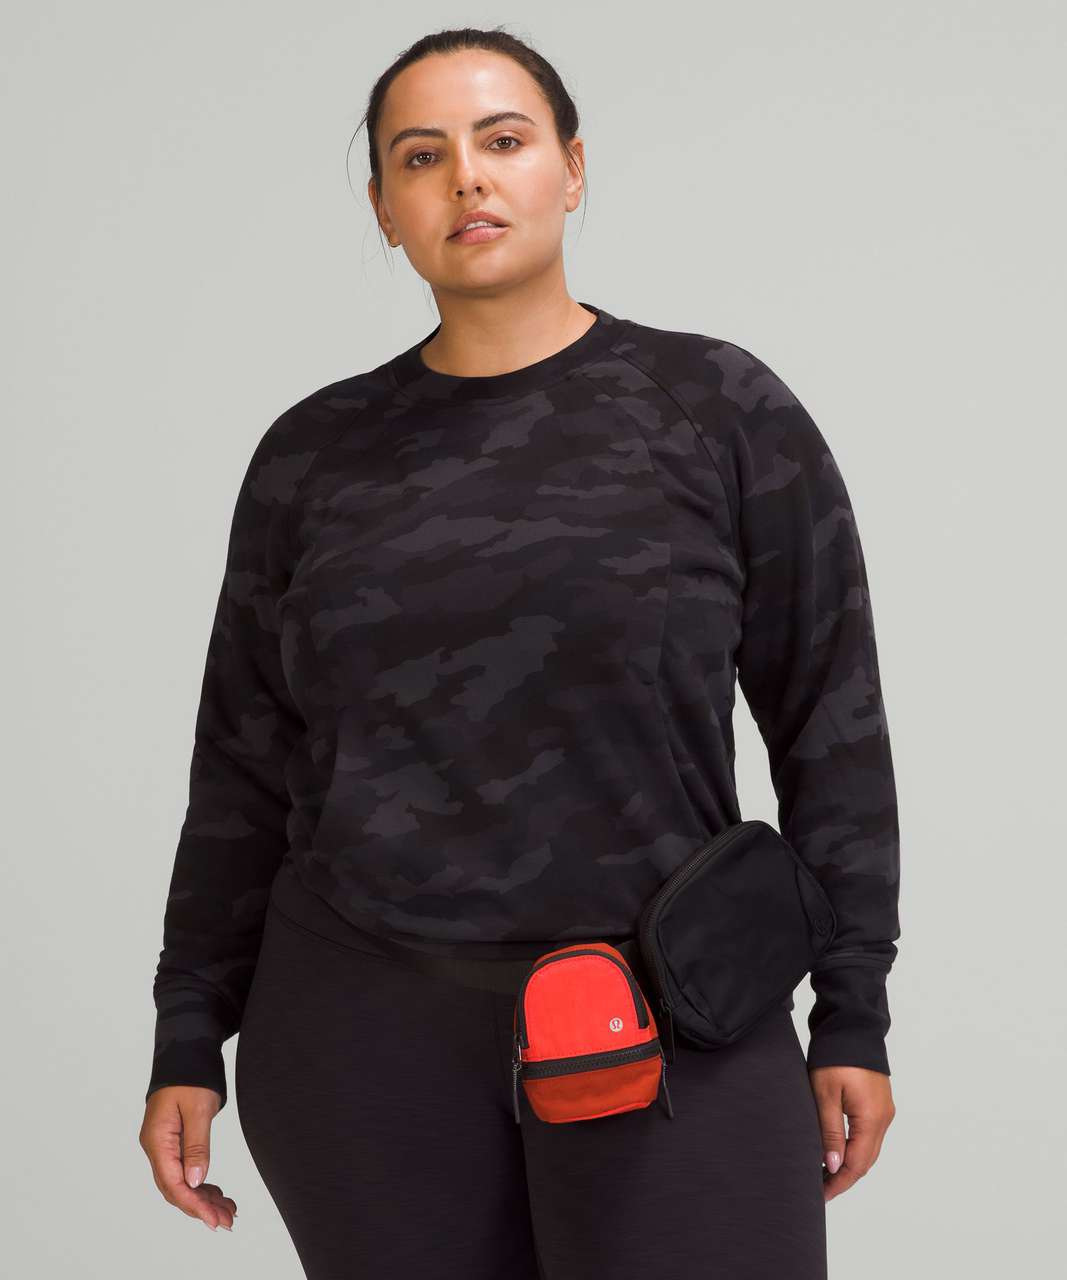 Lululemon City Adventurer Backpack *Nano - Autumn Red / Aztec Brick